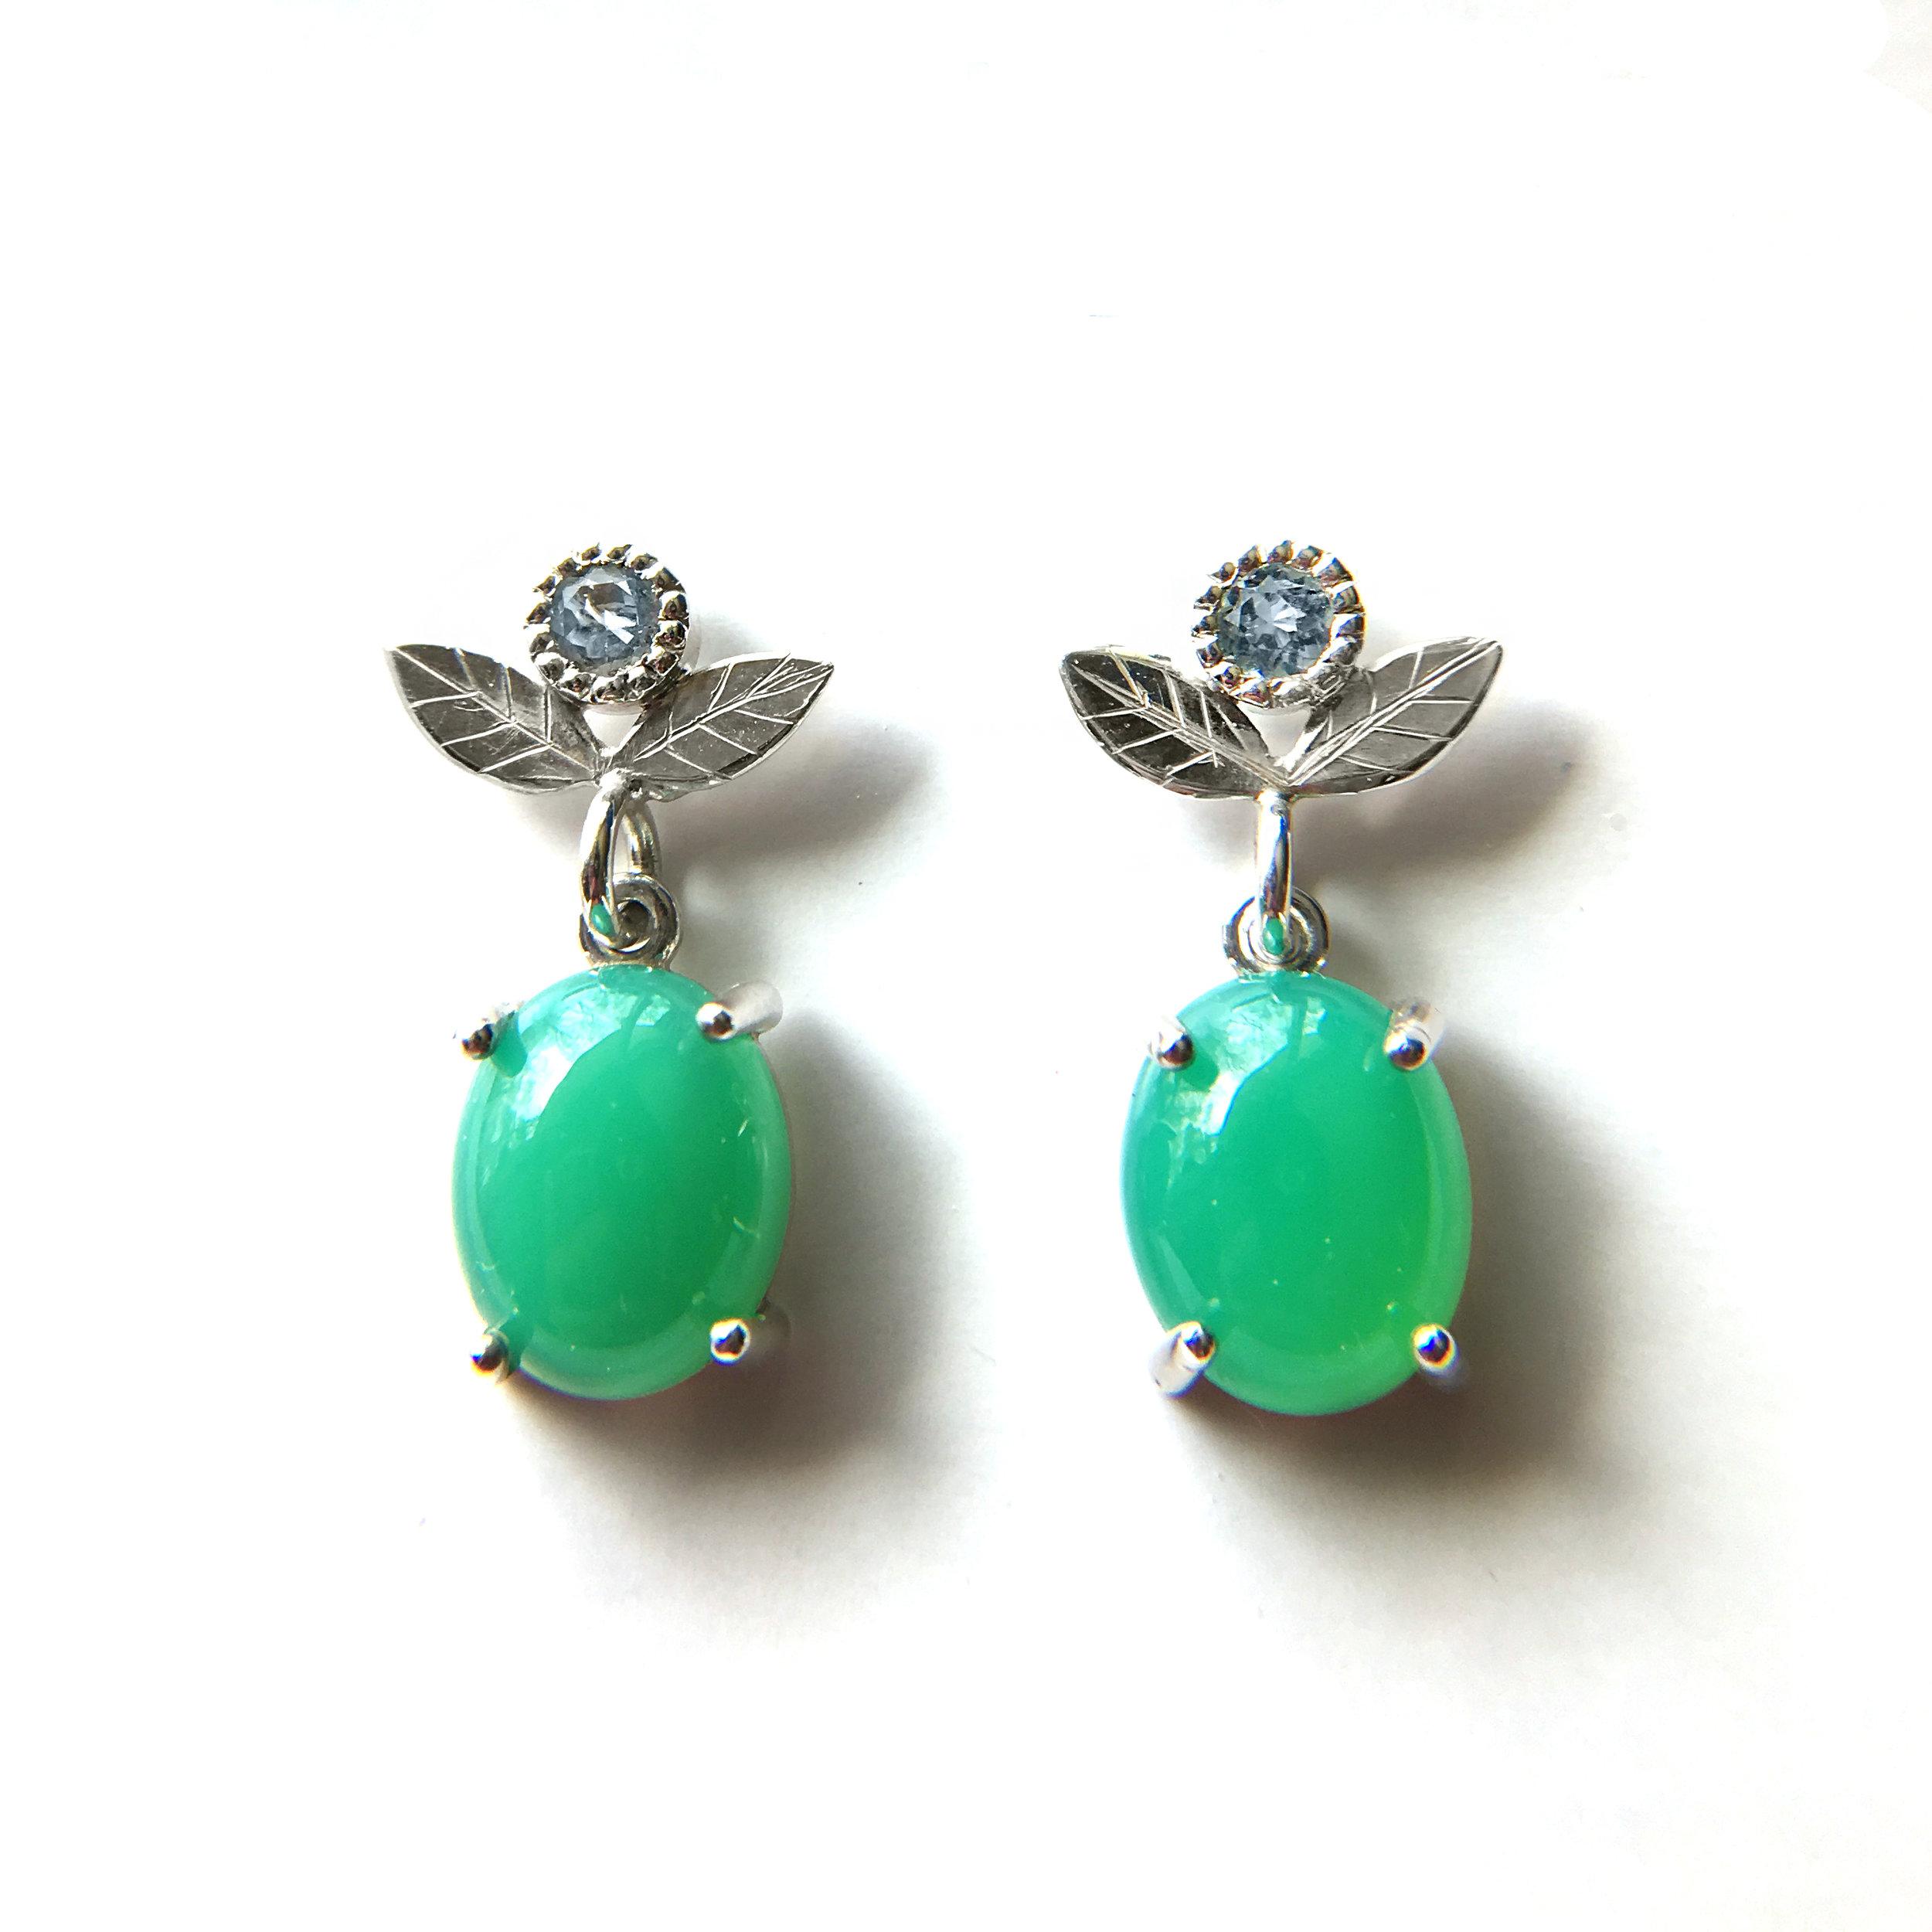 Floral inspired dangle post earrings